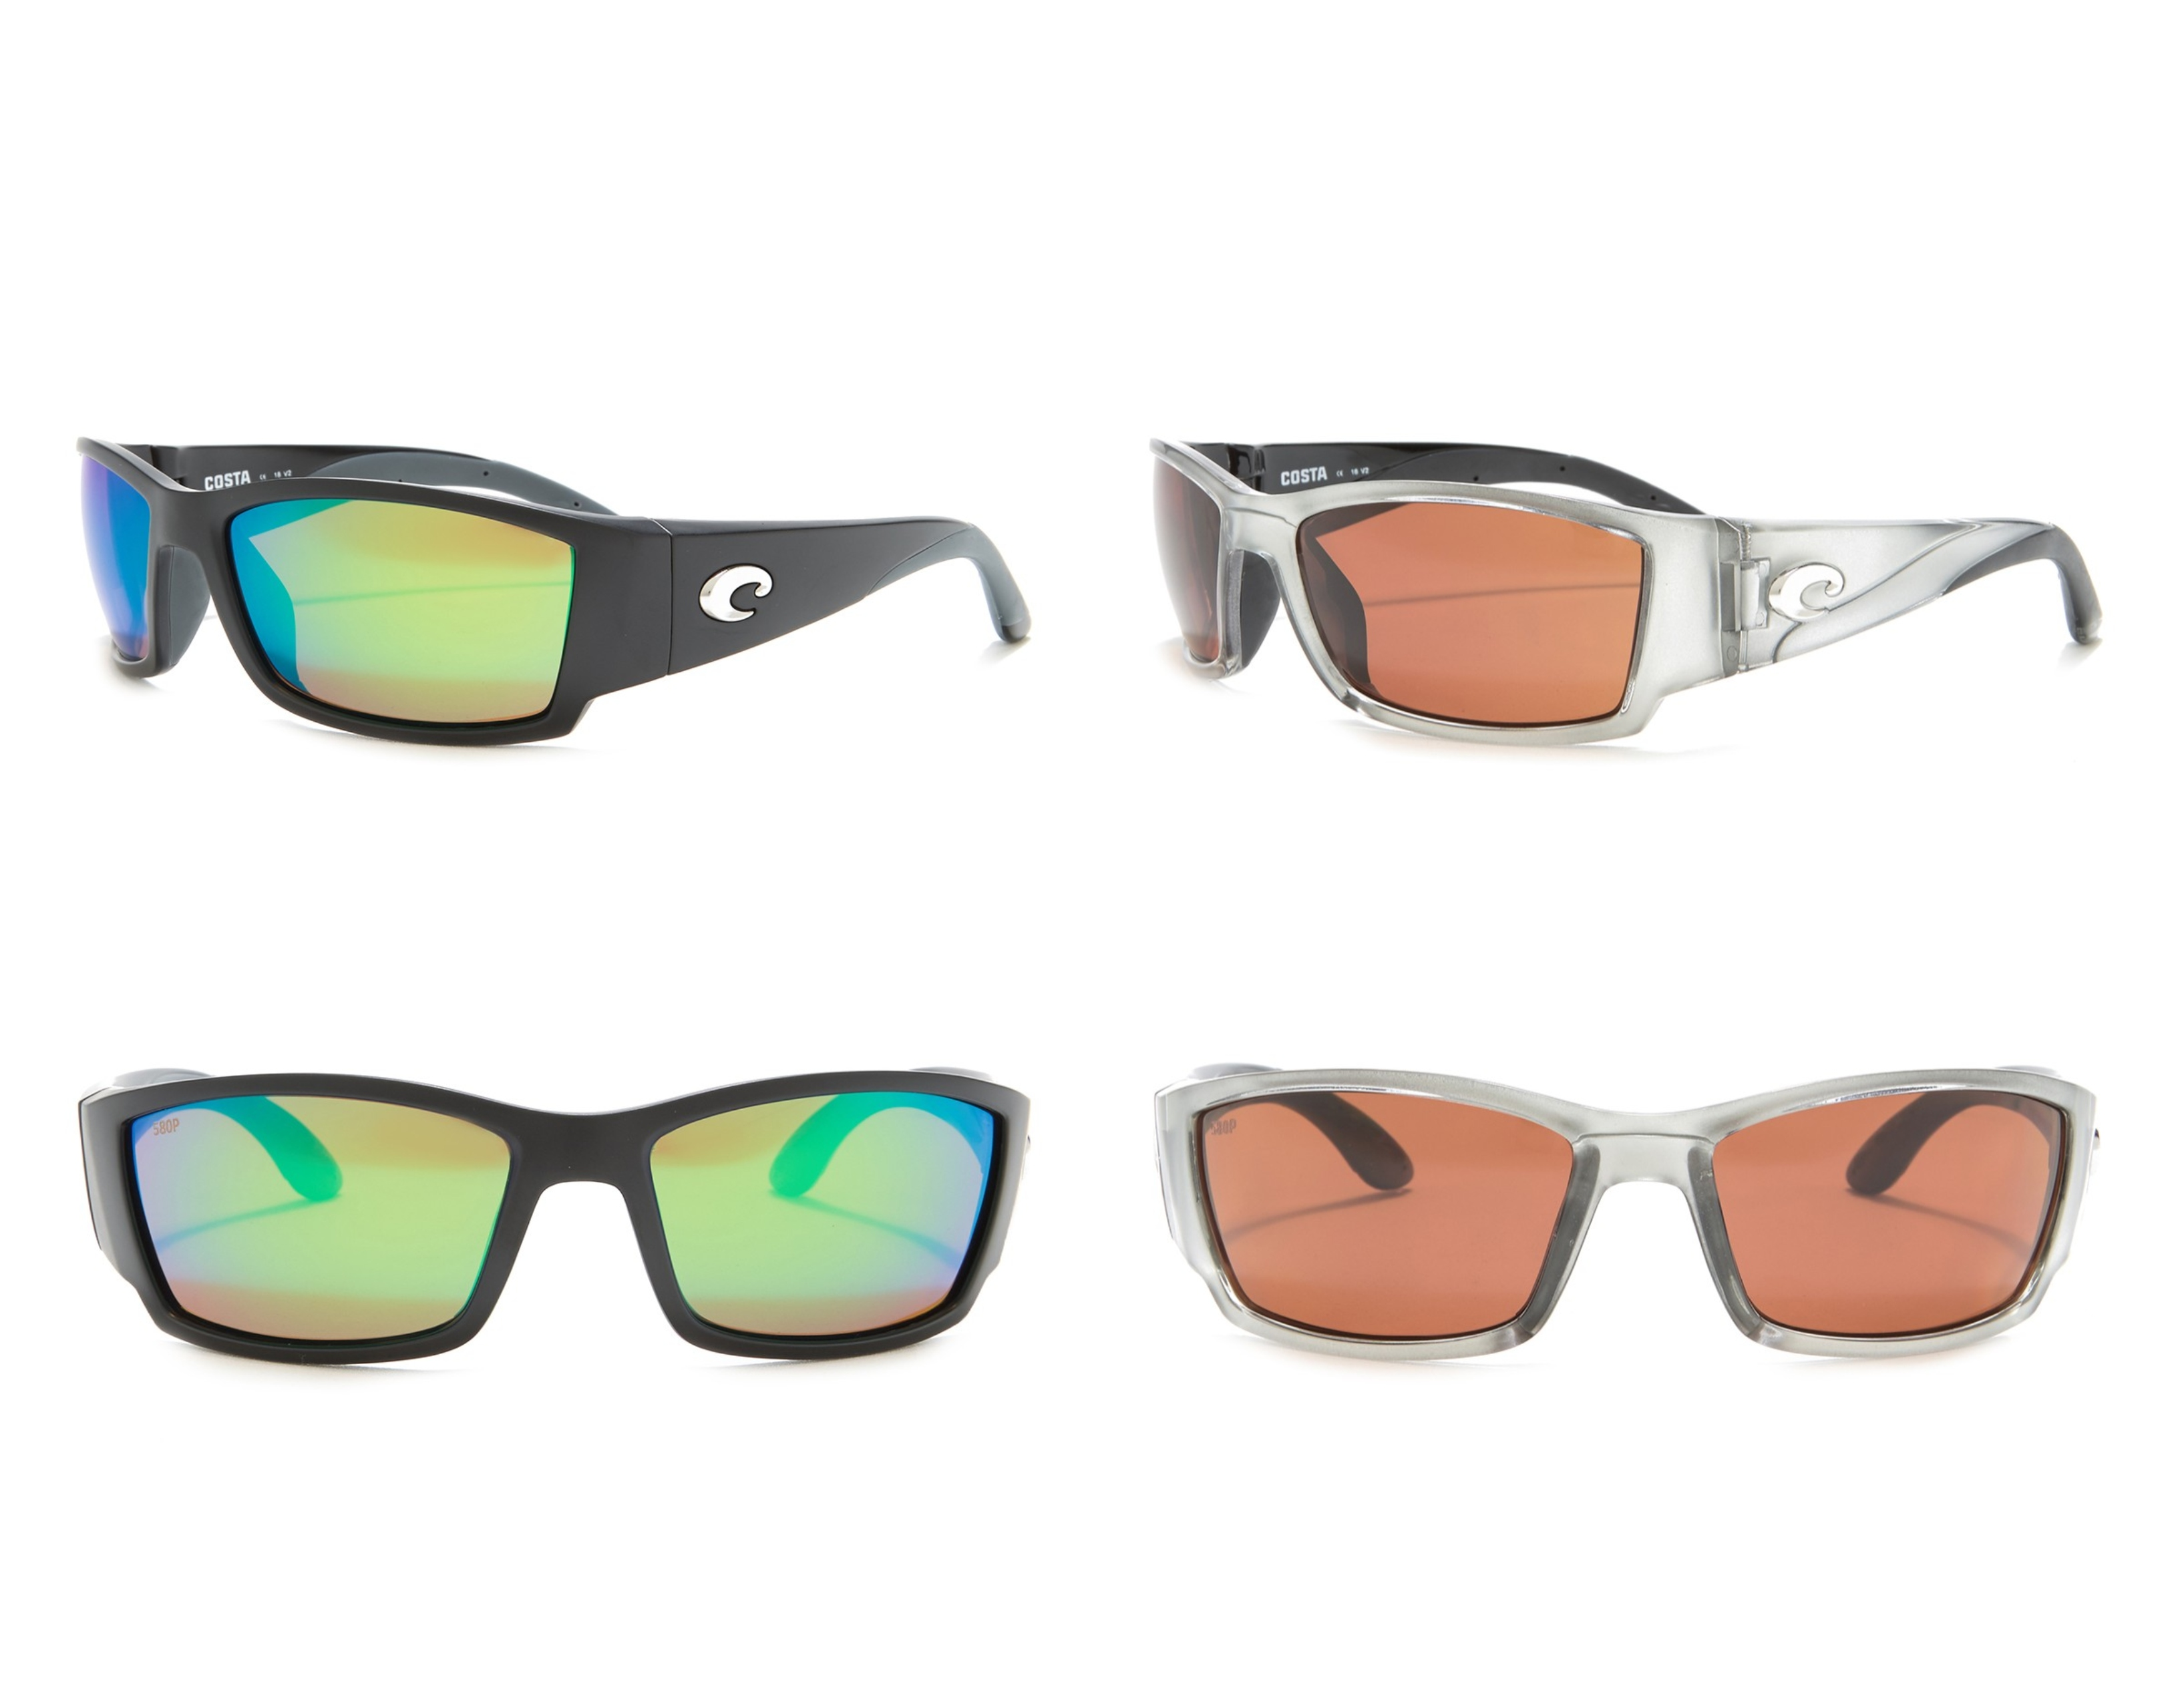 c54288b91 Nordstrom Rack: 40-50% Off Men's Costa Sunglasses! – Wear It For Less